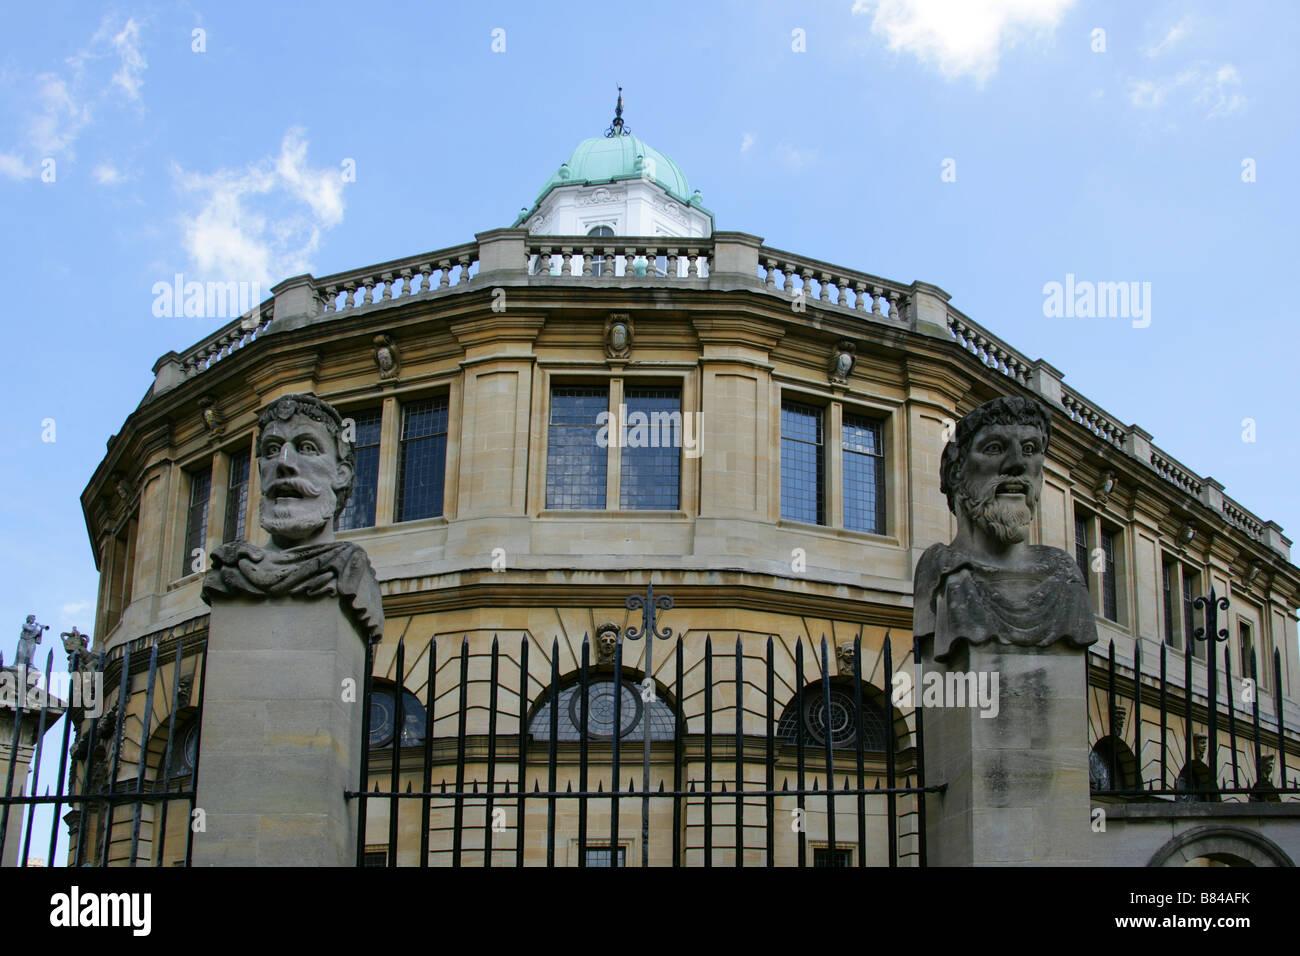 The Sheldonian Theatre, Oxford University, Oxford, Oxfordshire, UK Stock Photo